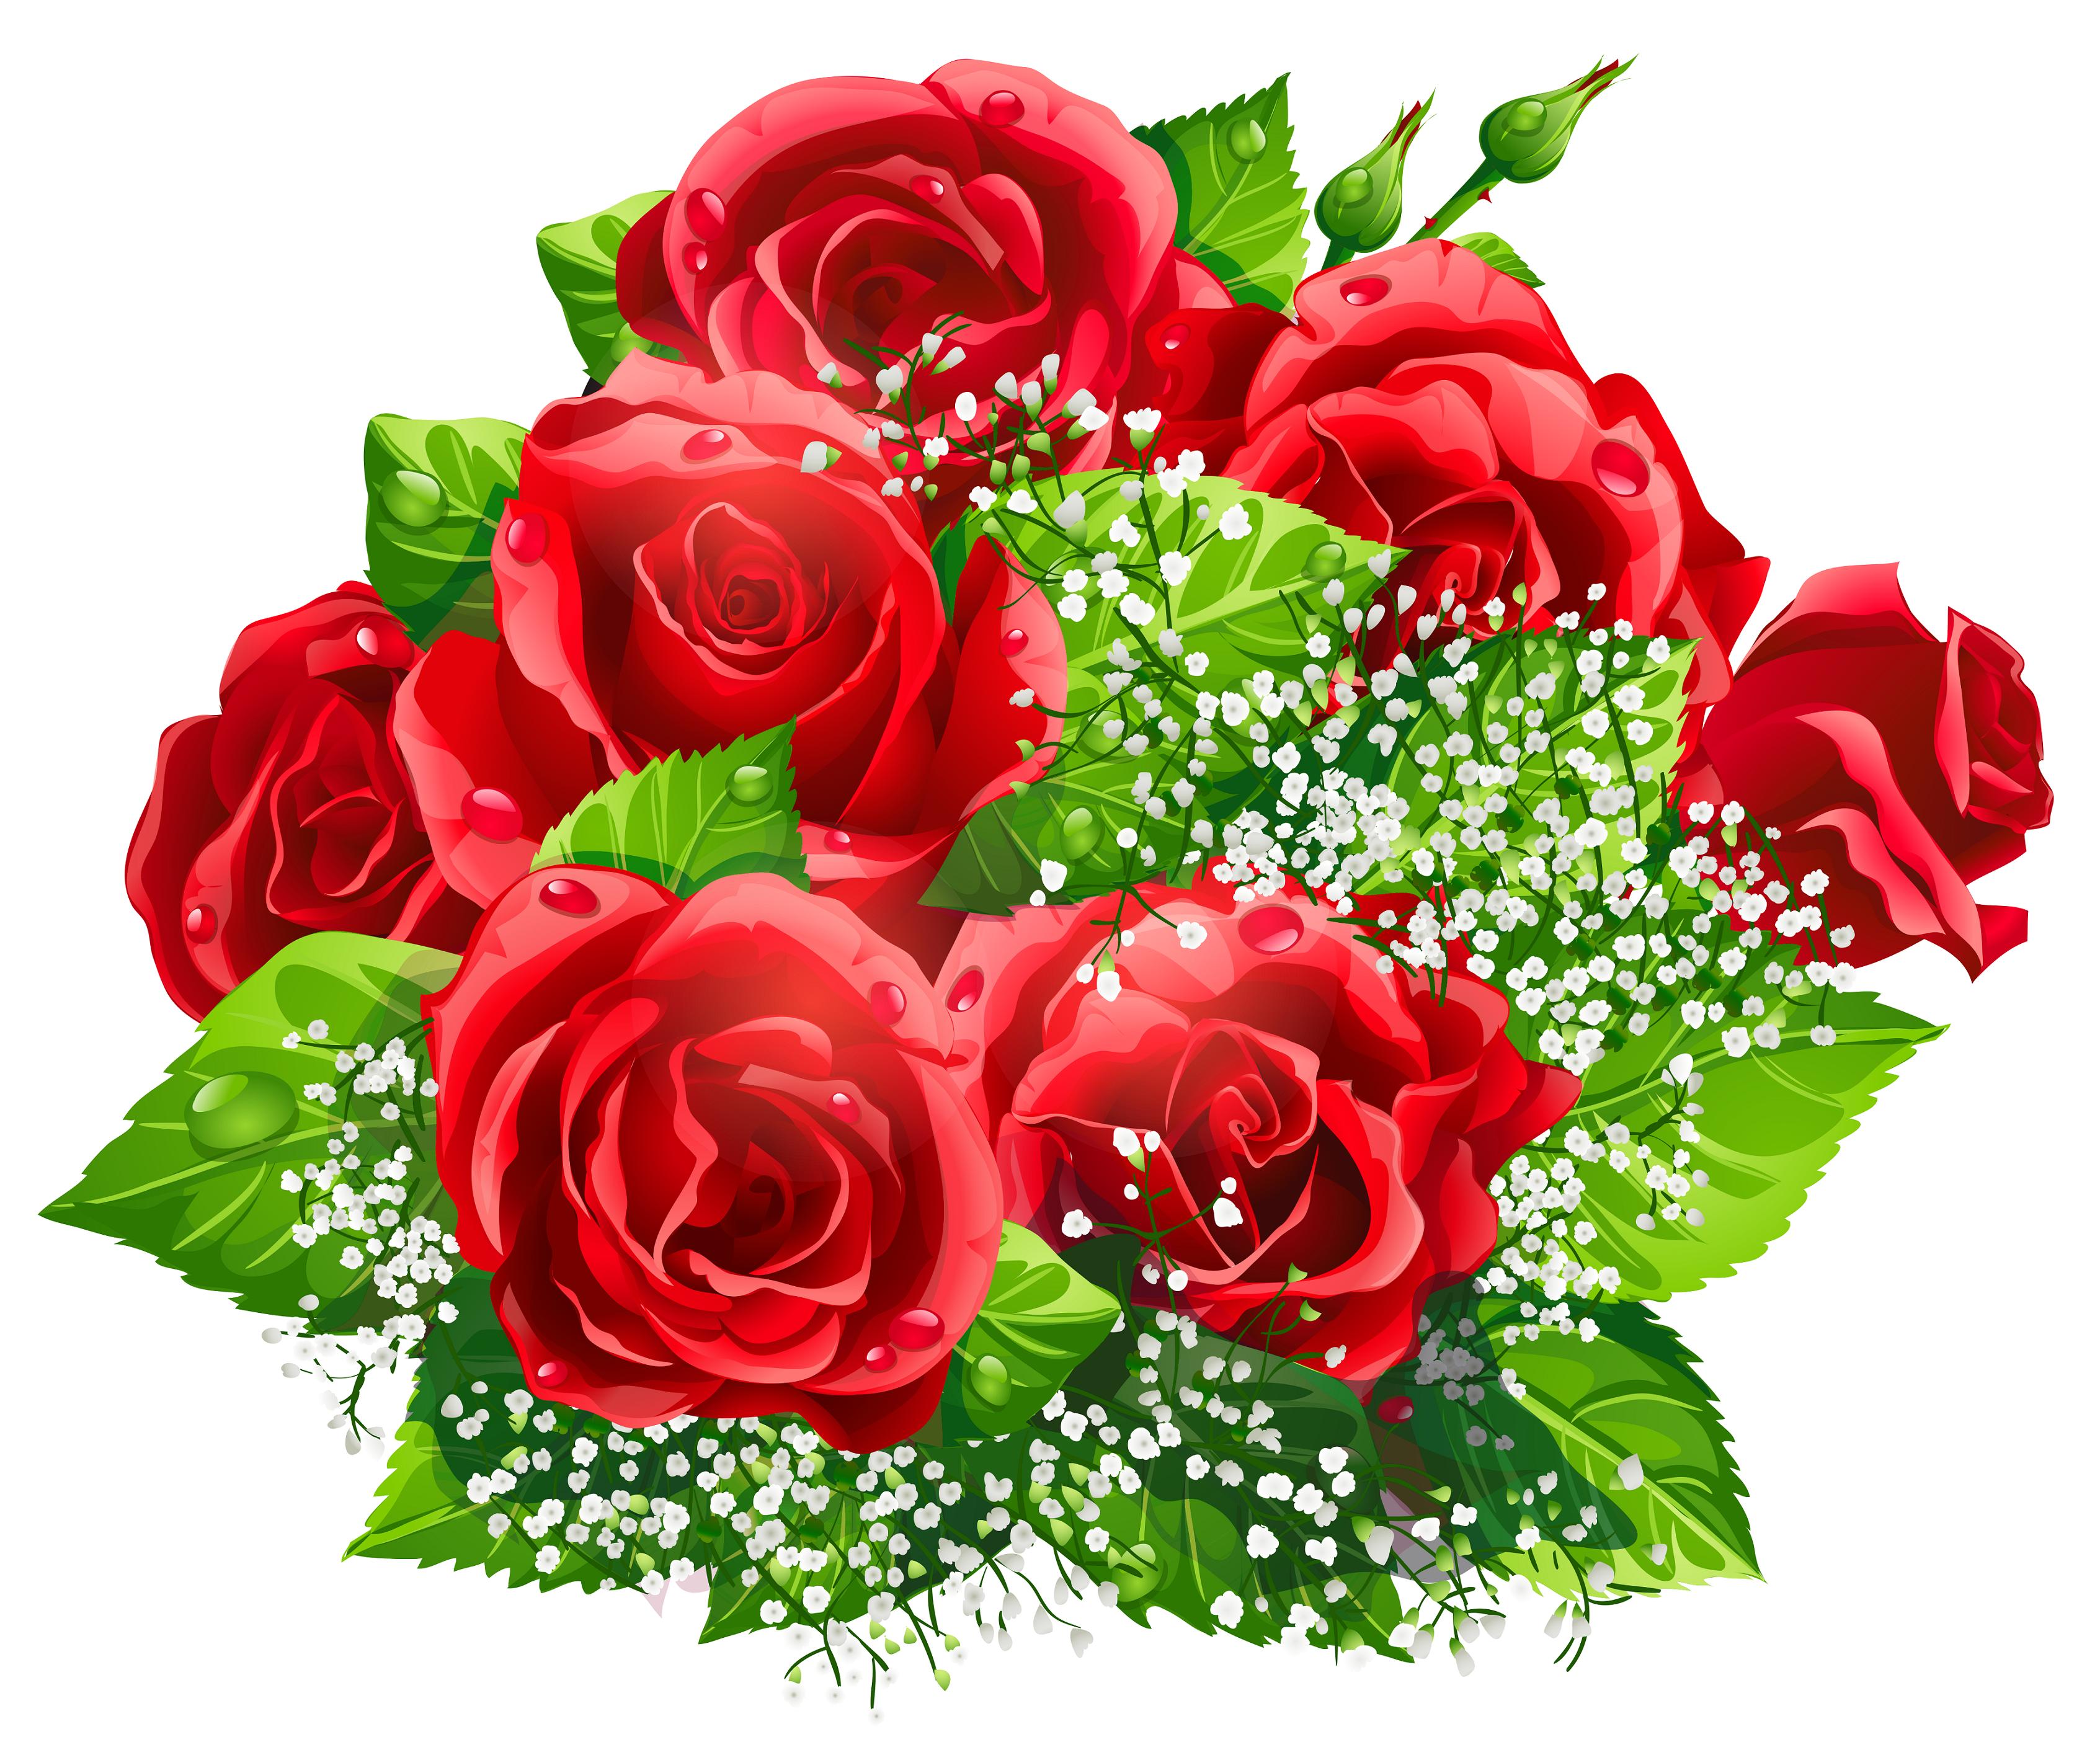 Red Roses Bouquet Clipart Hoa Hoa Hồng